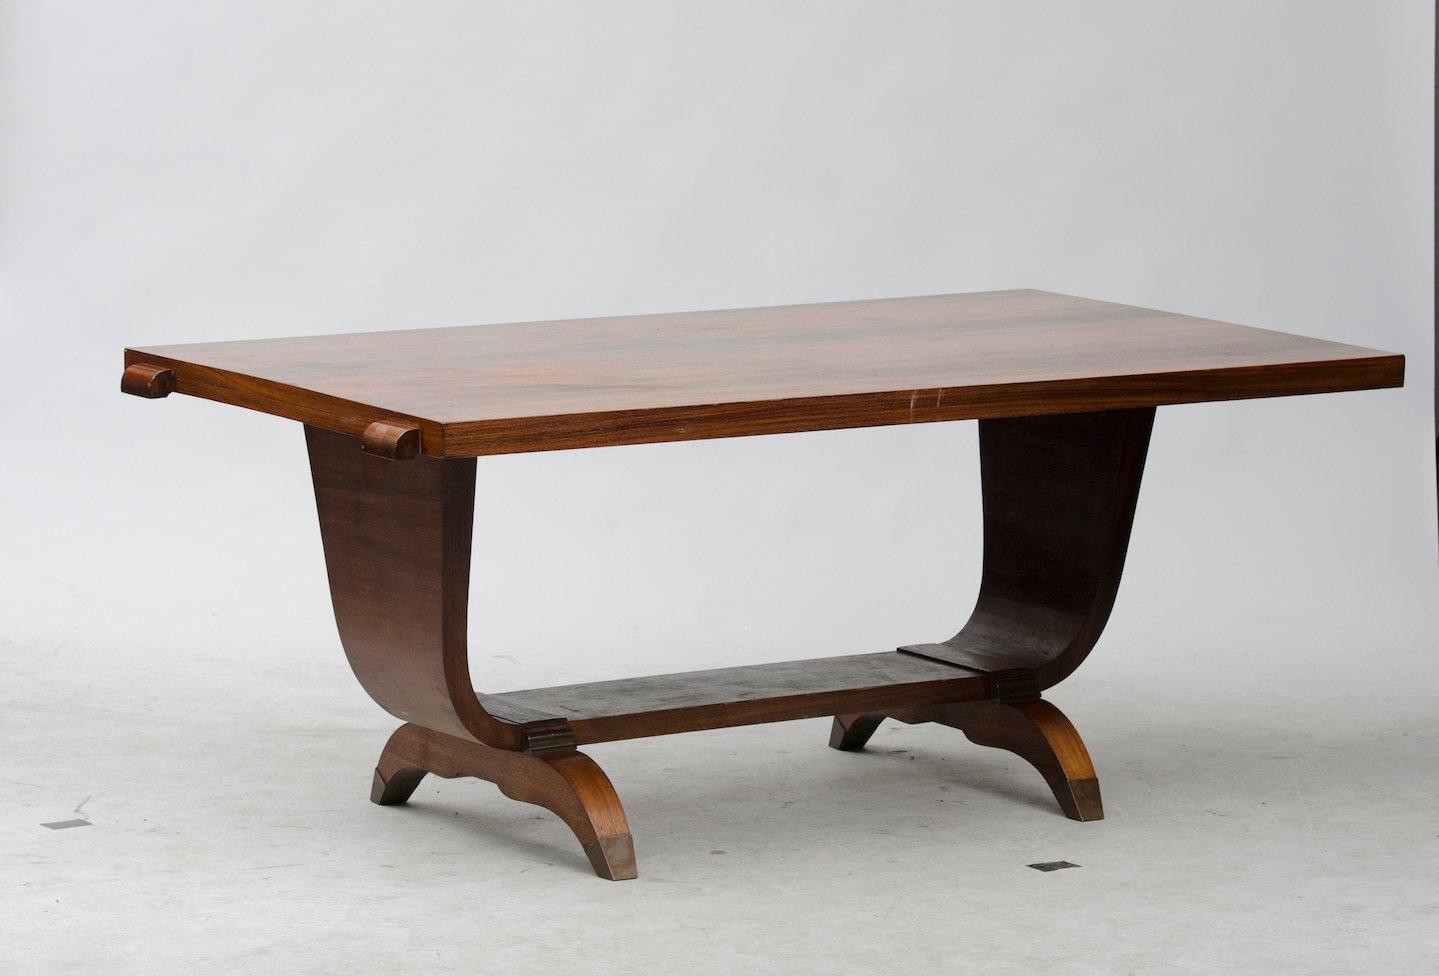 Vintage Art Deco Dining Table for sale at Pamono : vintage art deco dining table 1 from www.pamono.com.au size 1439 x 976 jpeg 571kB